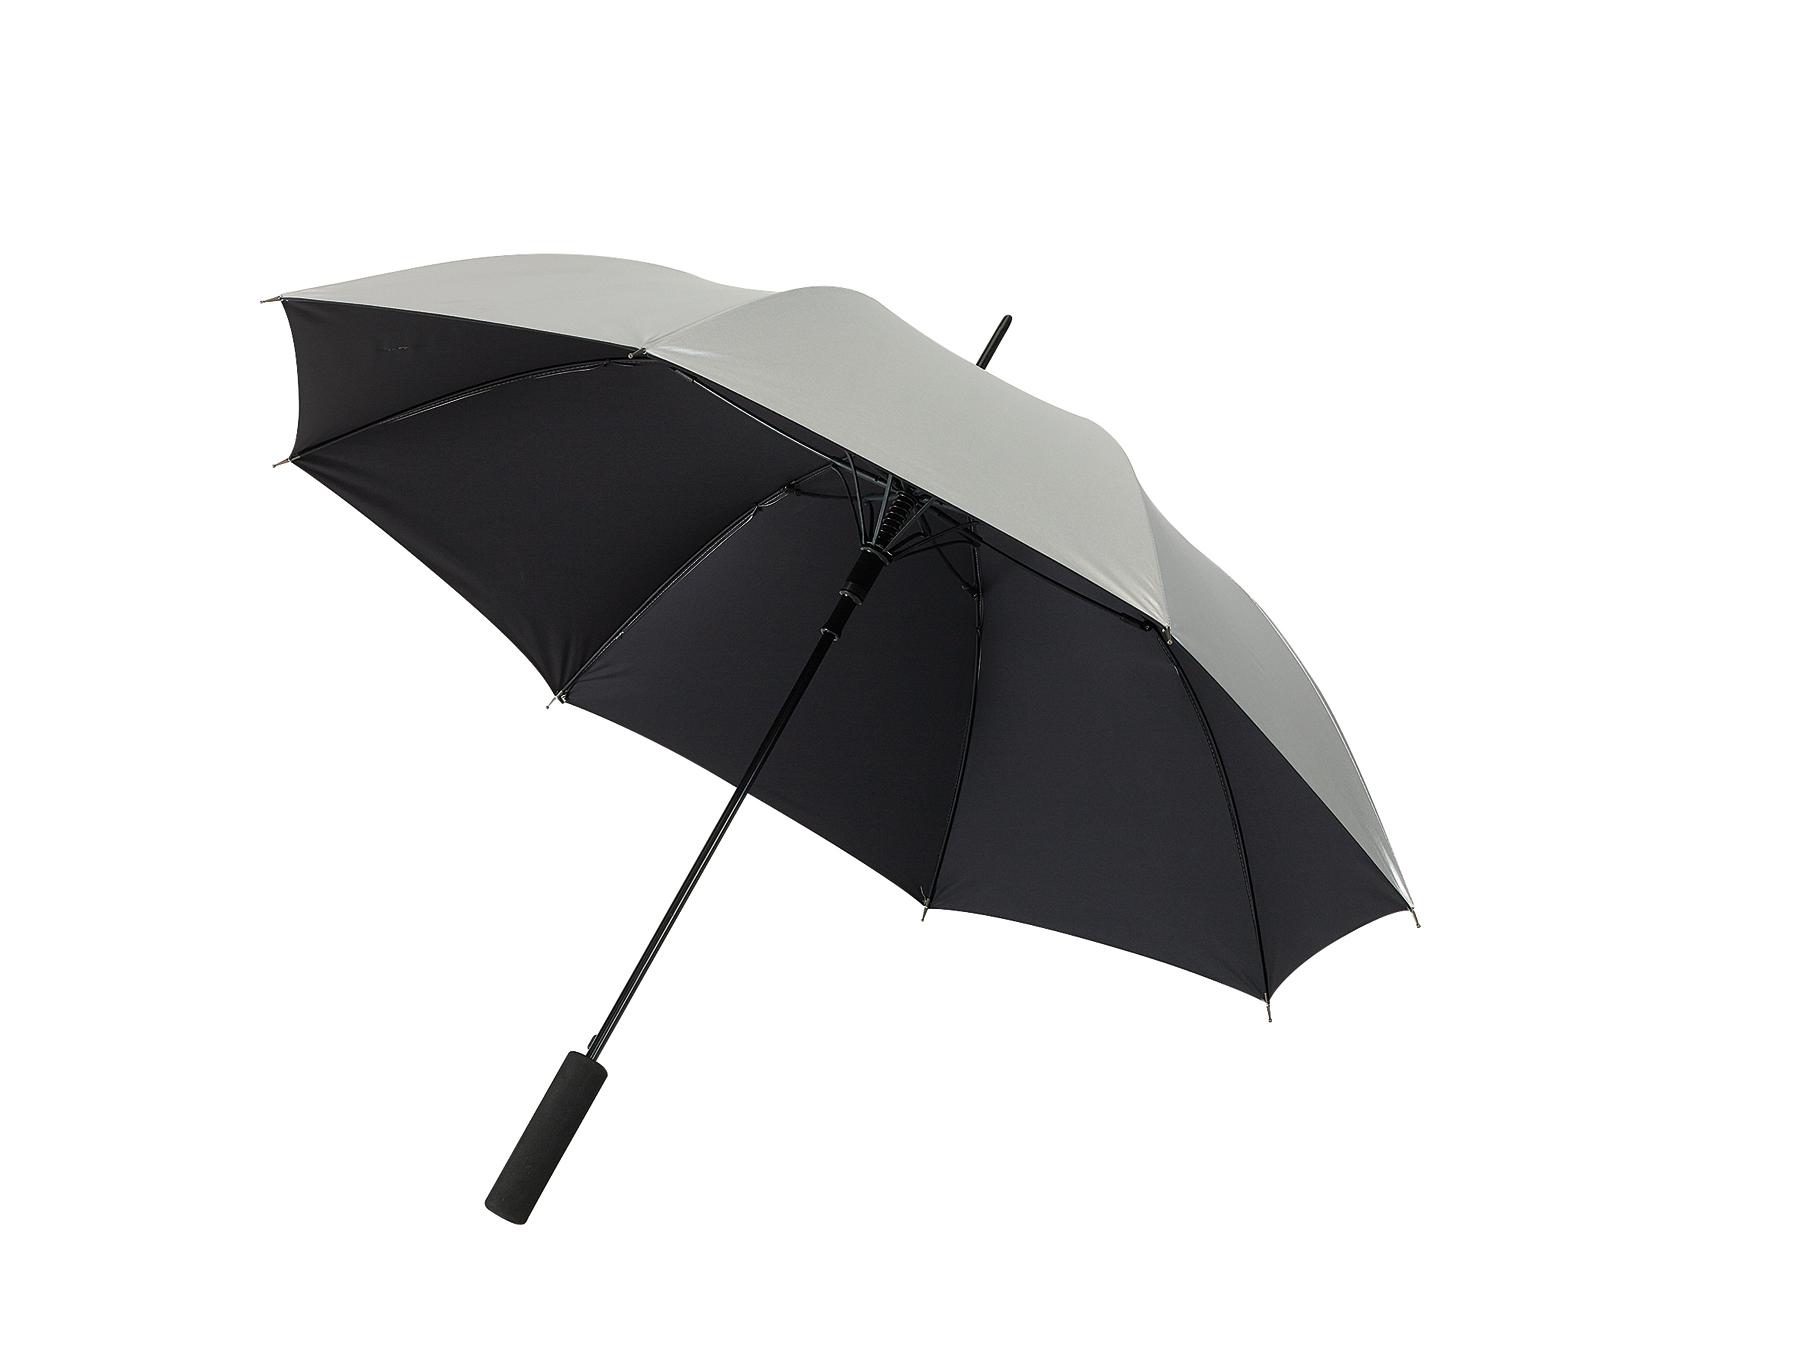 Automatyczny parasol JIVE, czarny, srebrny